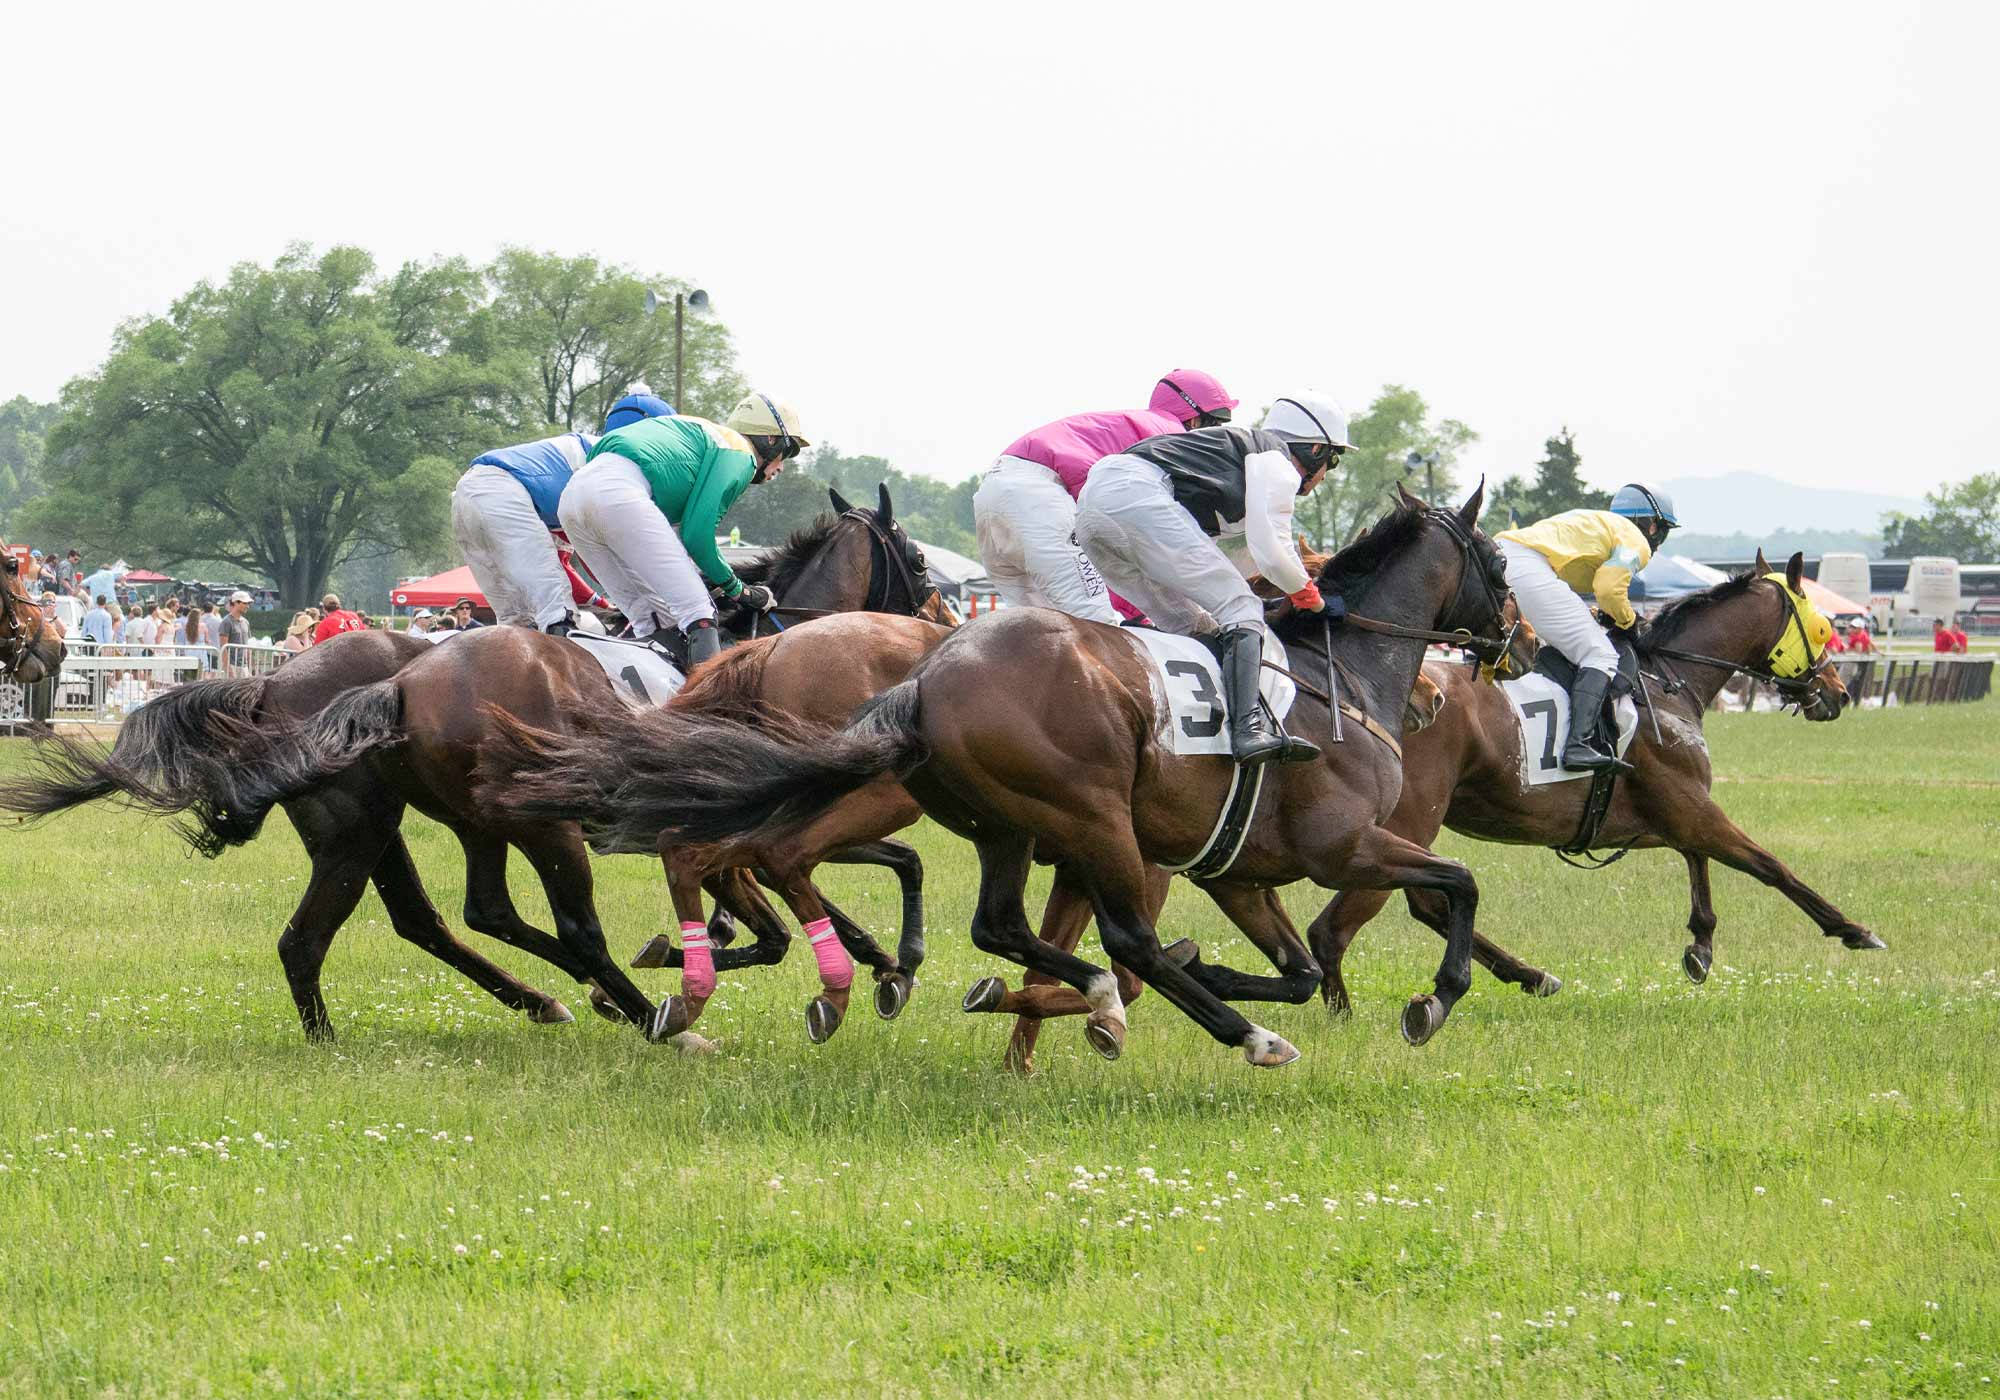 Virginia horse racing at Foxfield races